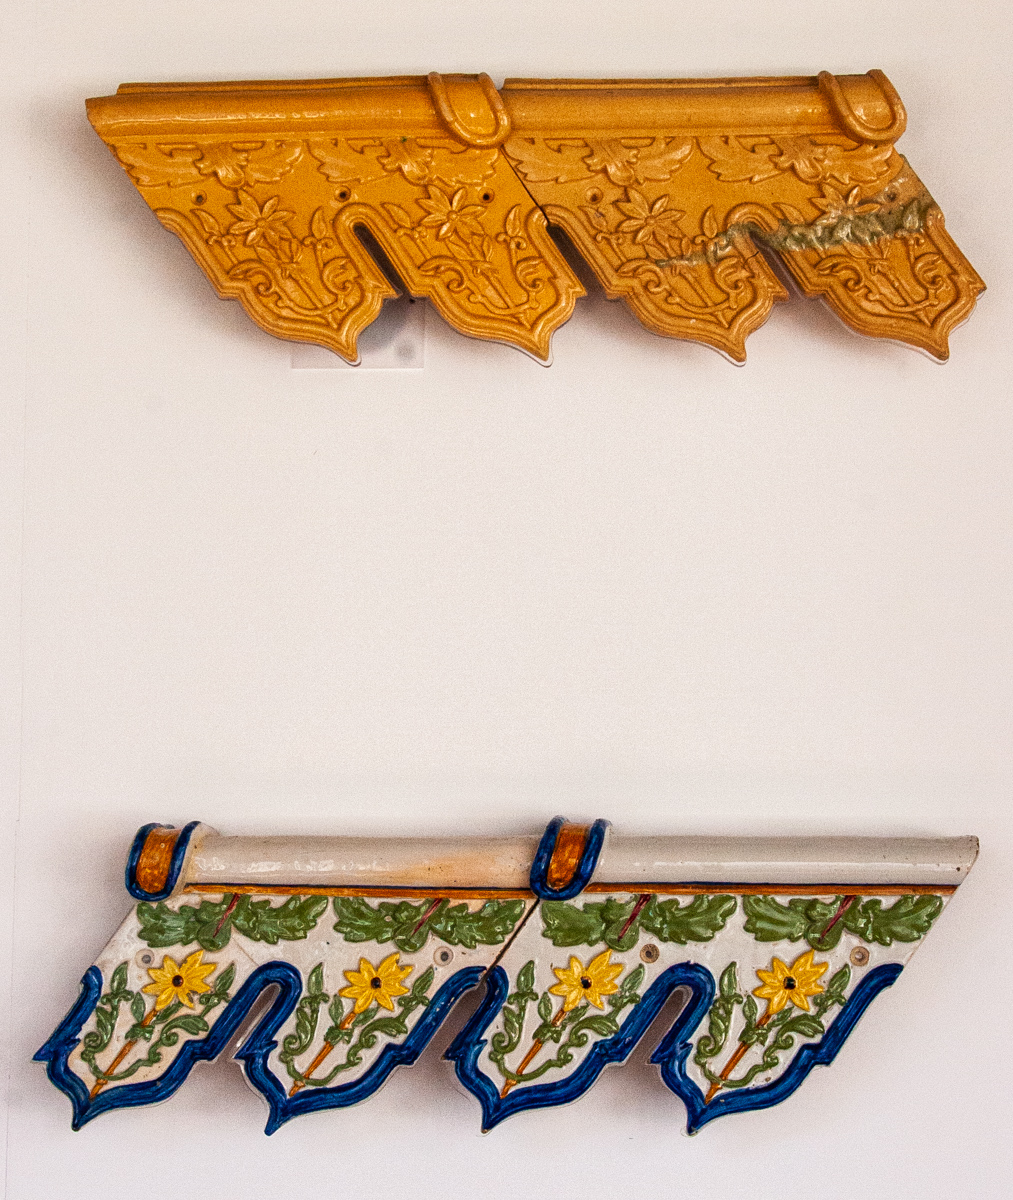 19th Century Molded Eaves Tiles